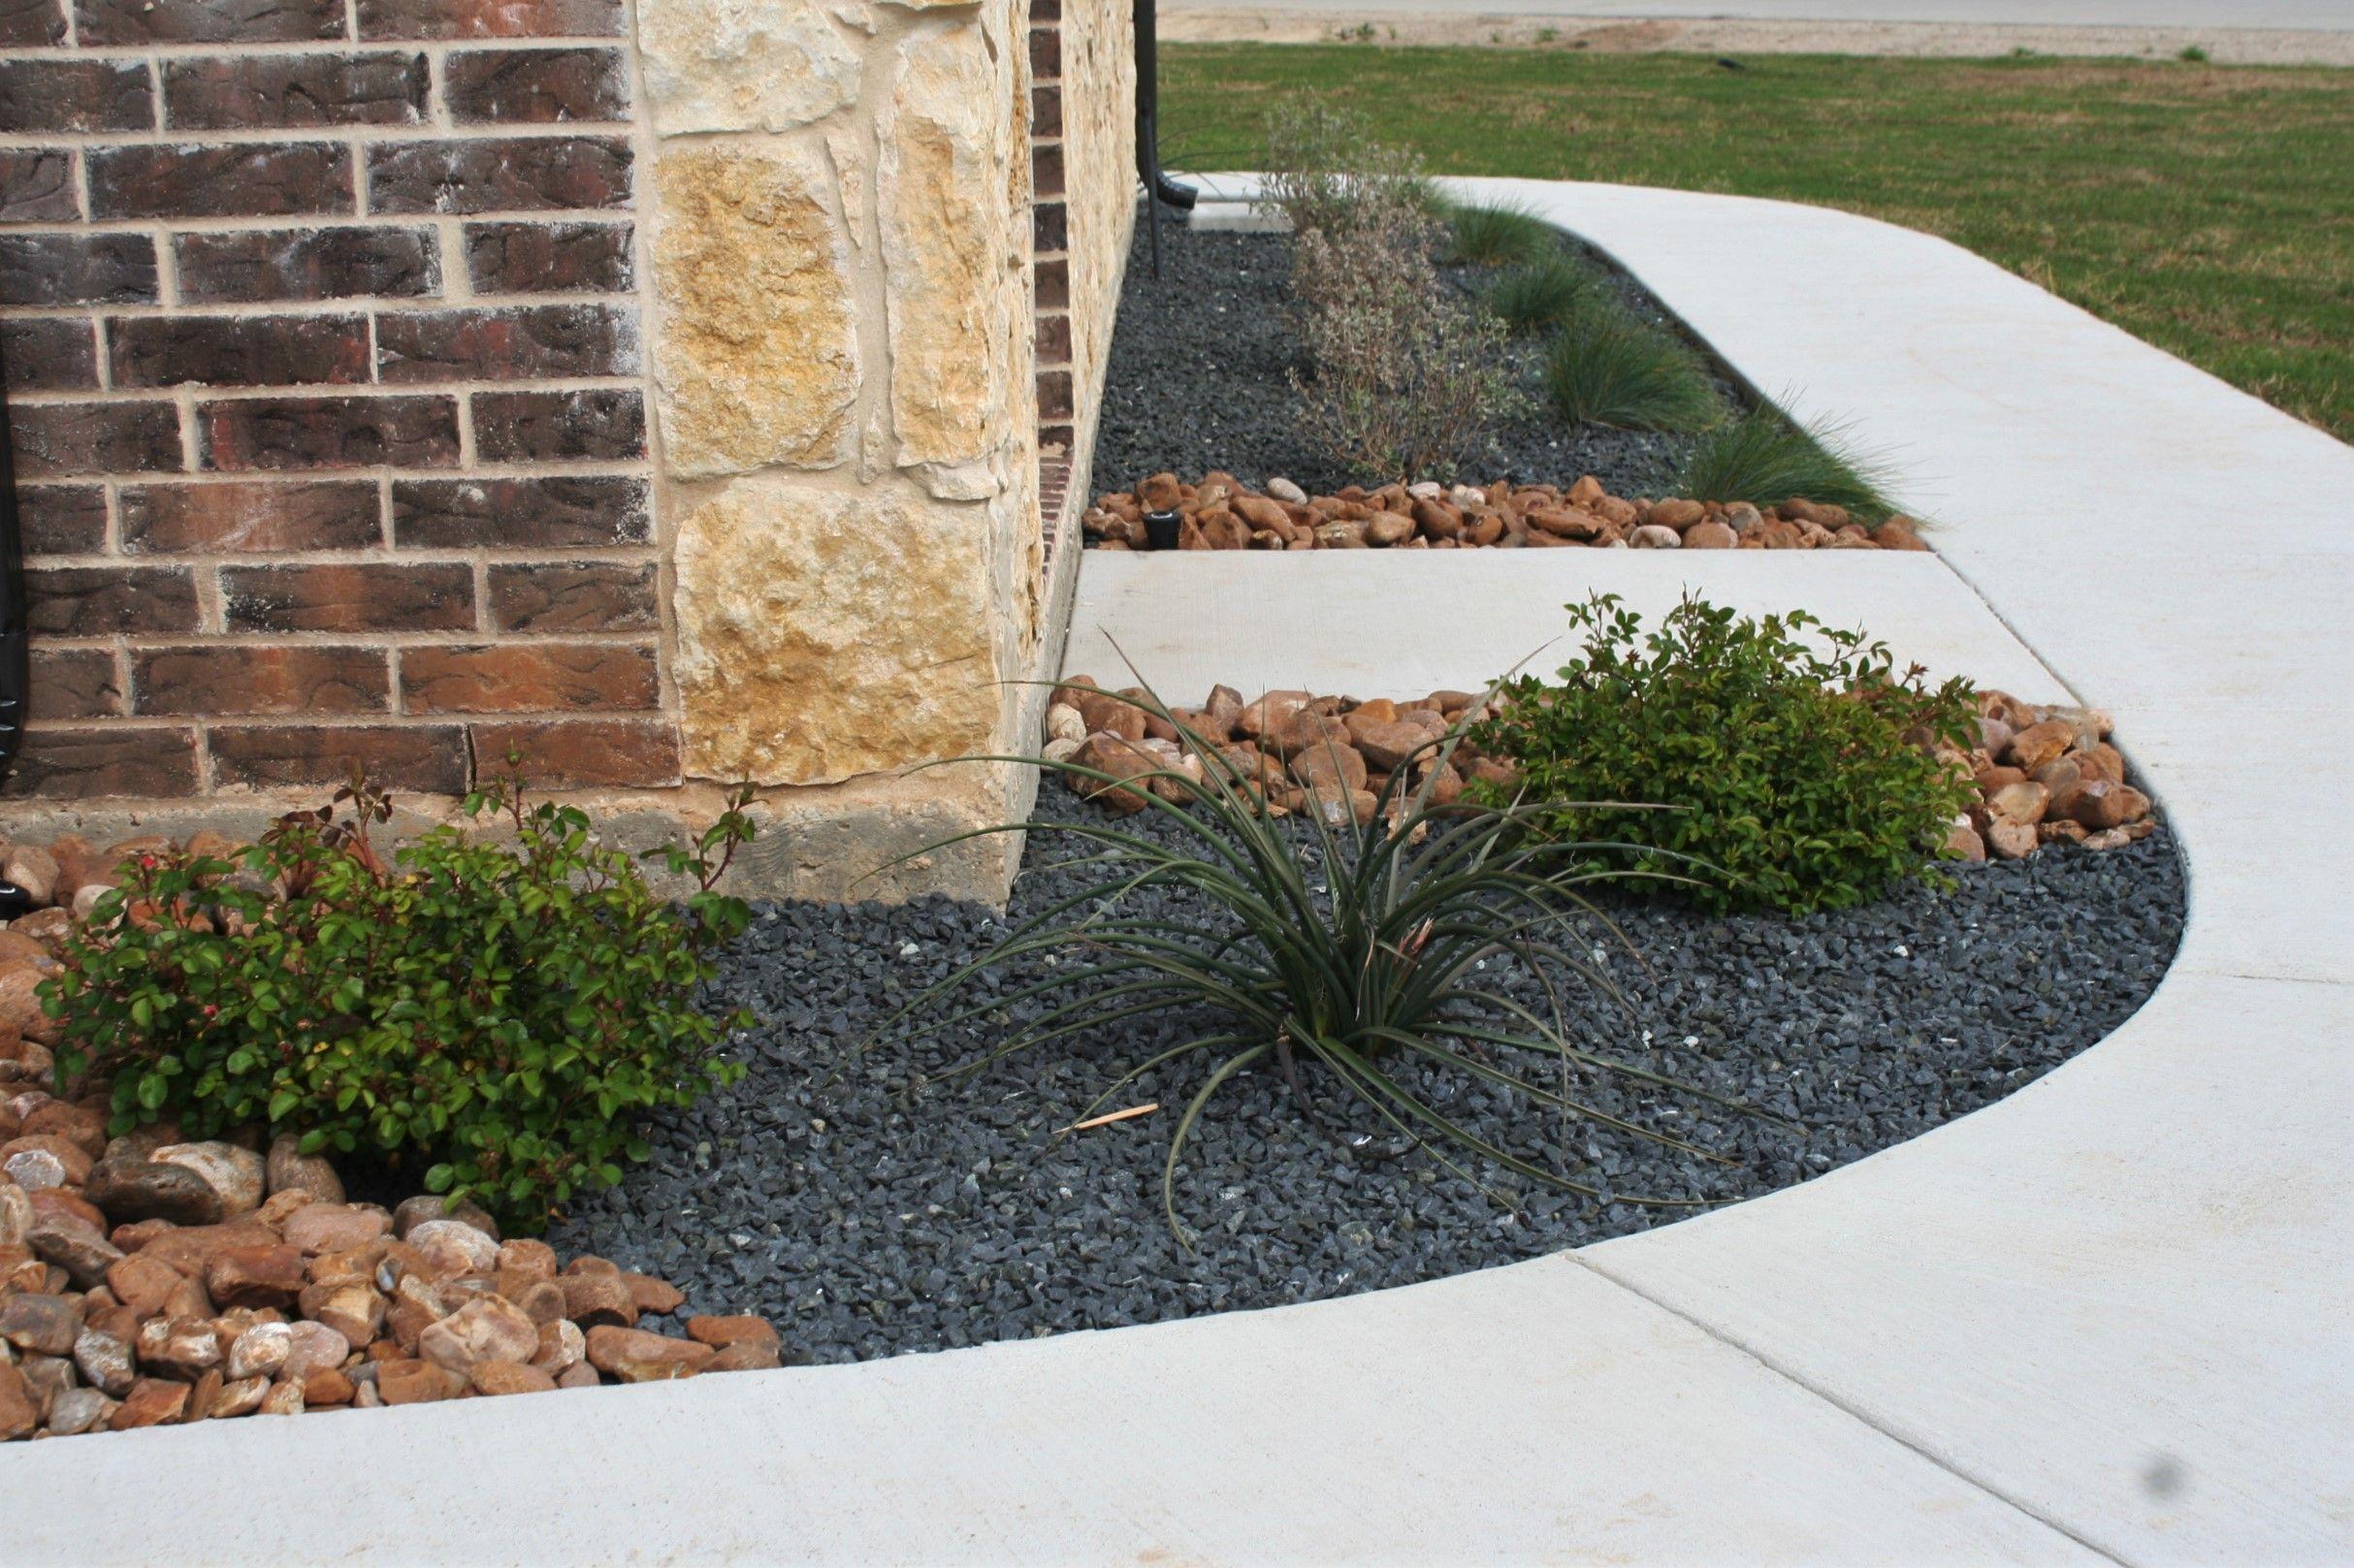 riverrock blackstar gravel flowerbed southwest texas